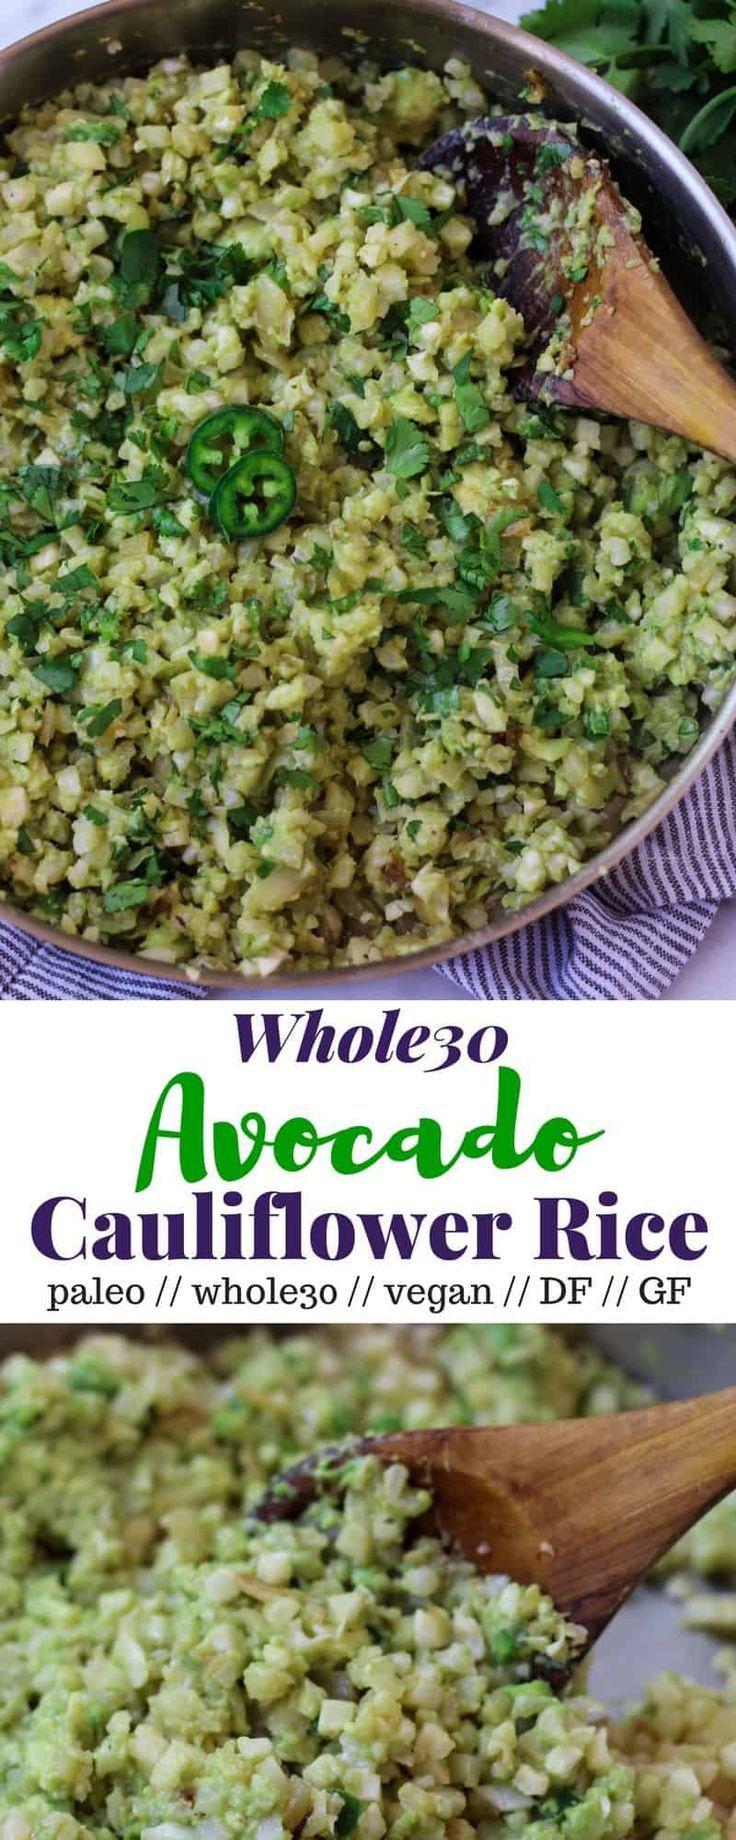 Photo of Avocado Cauliflower Rice